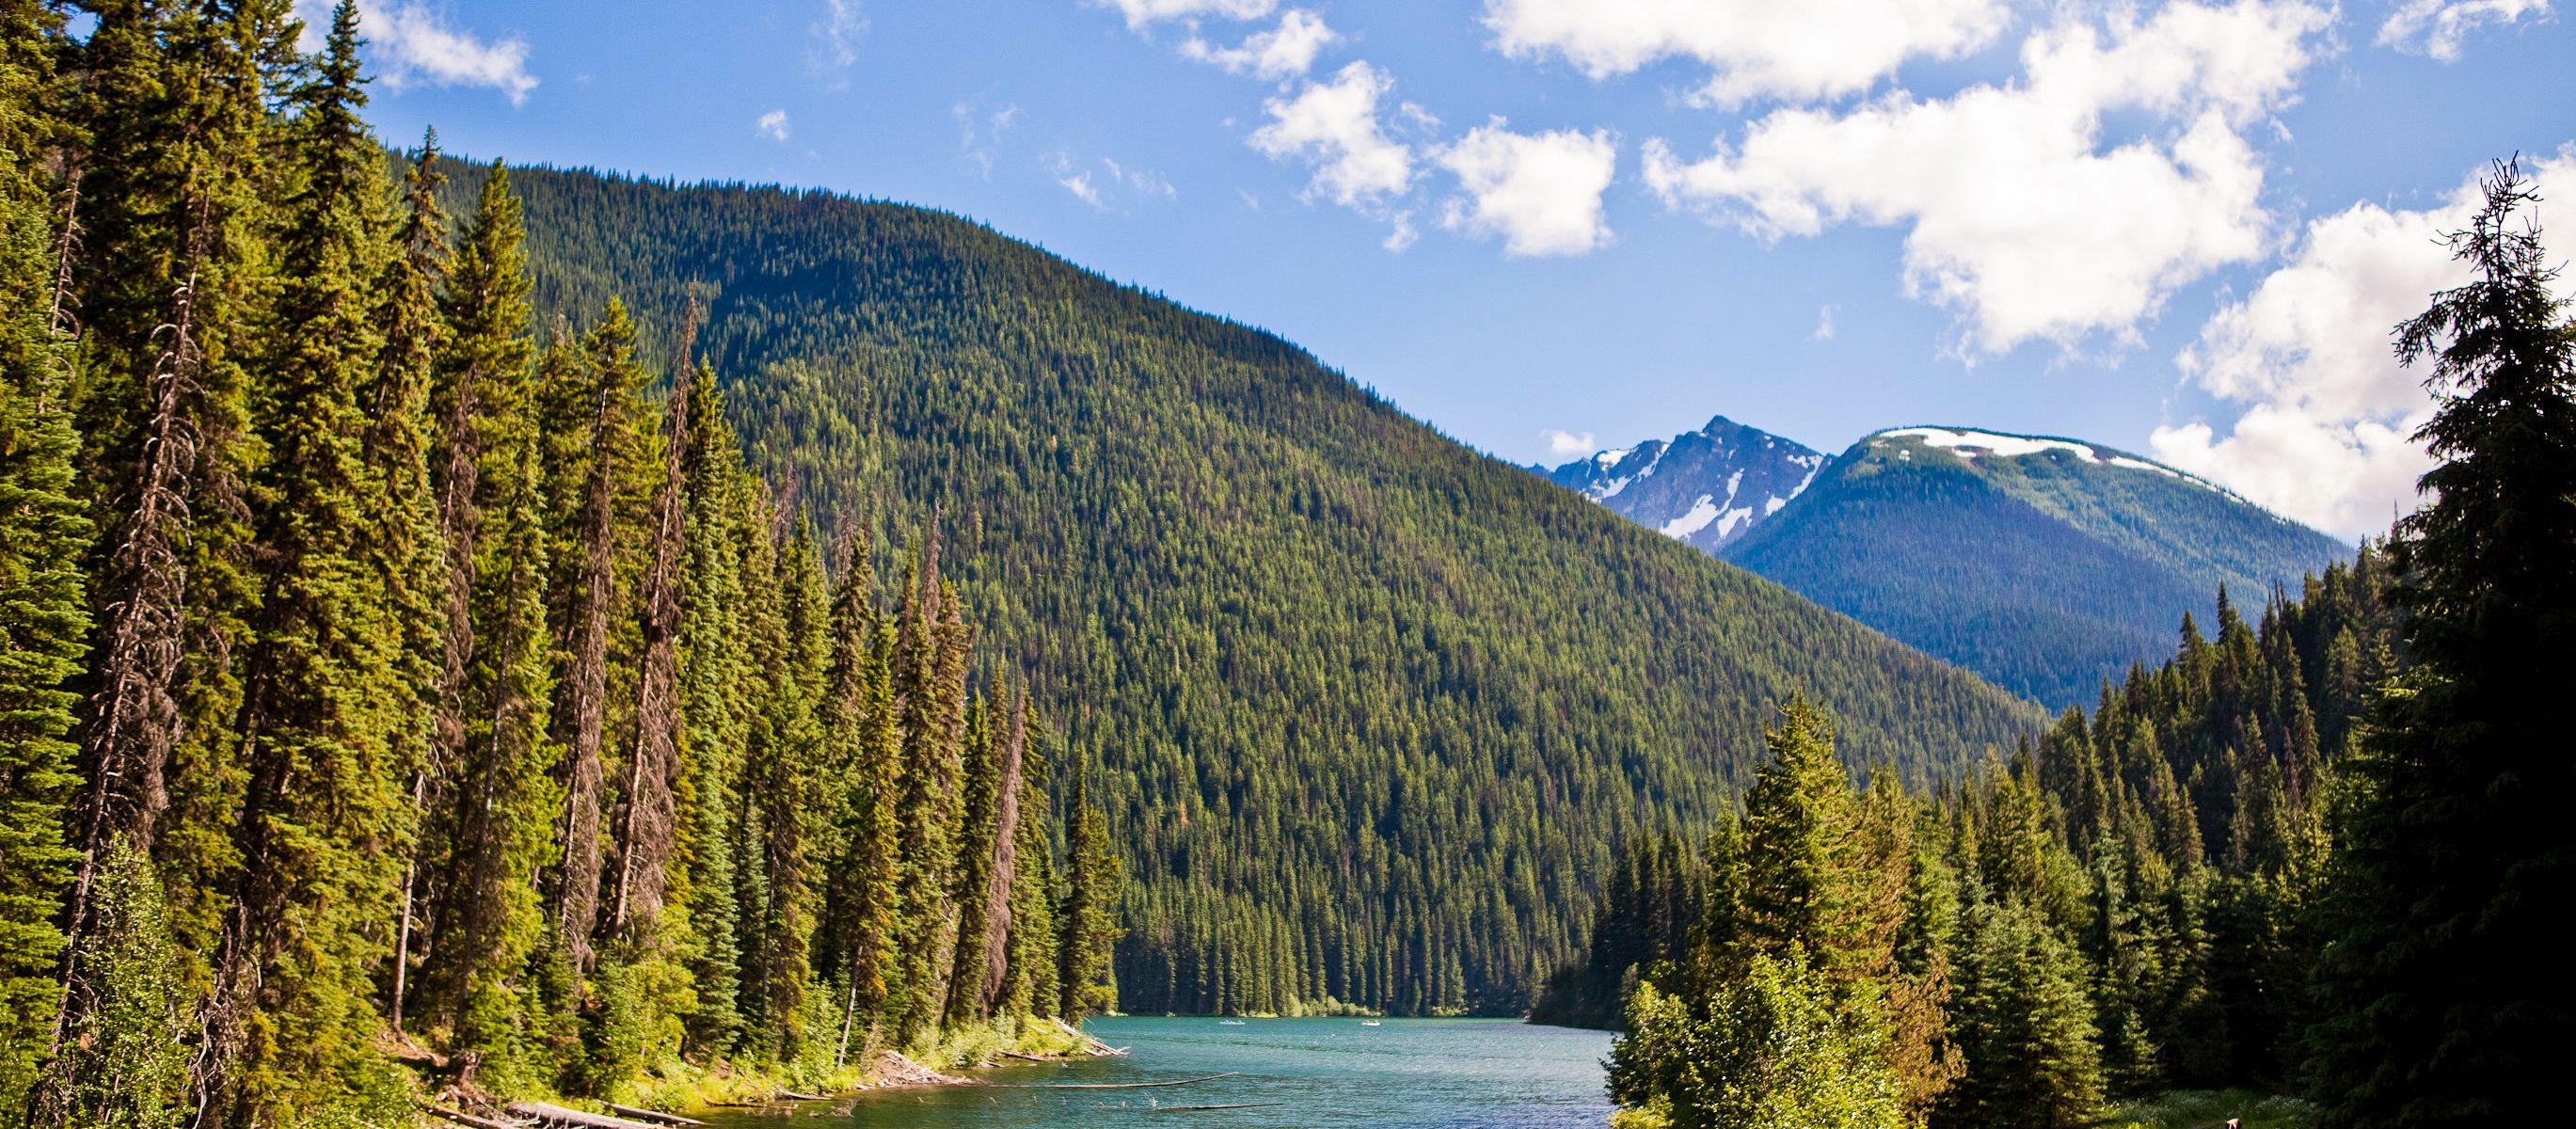 Blick auf den Lightning Lake im Manning Provincial Park in British Columbia